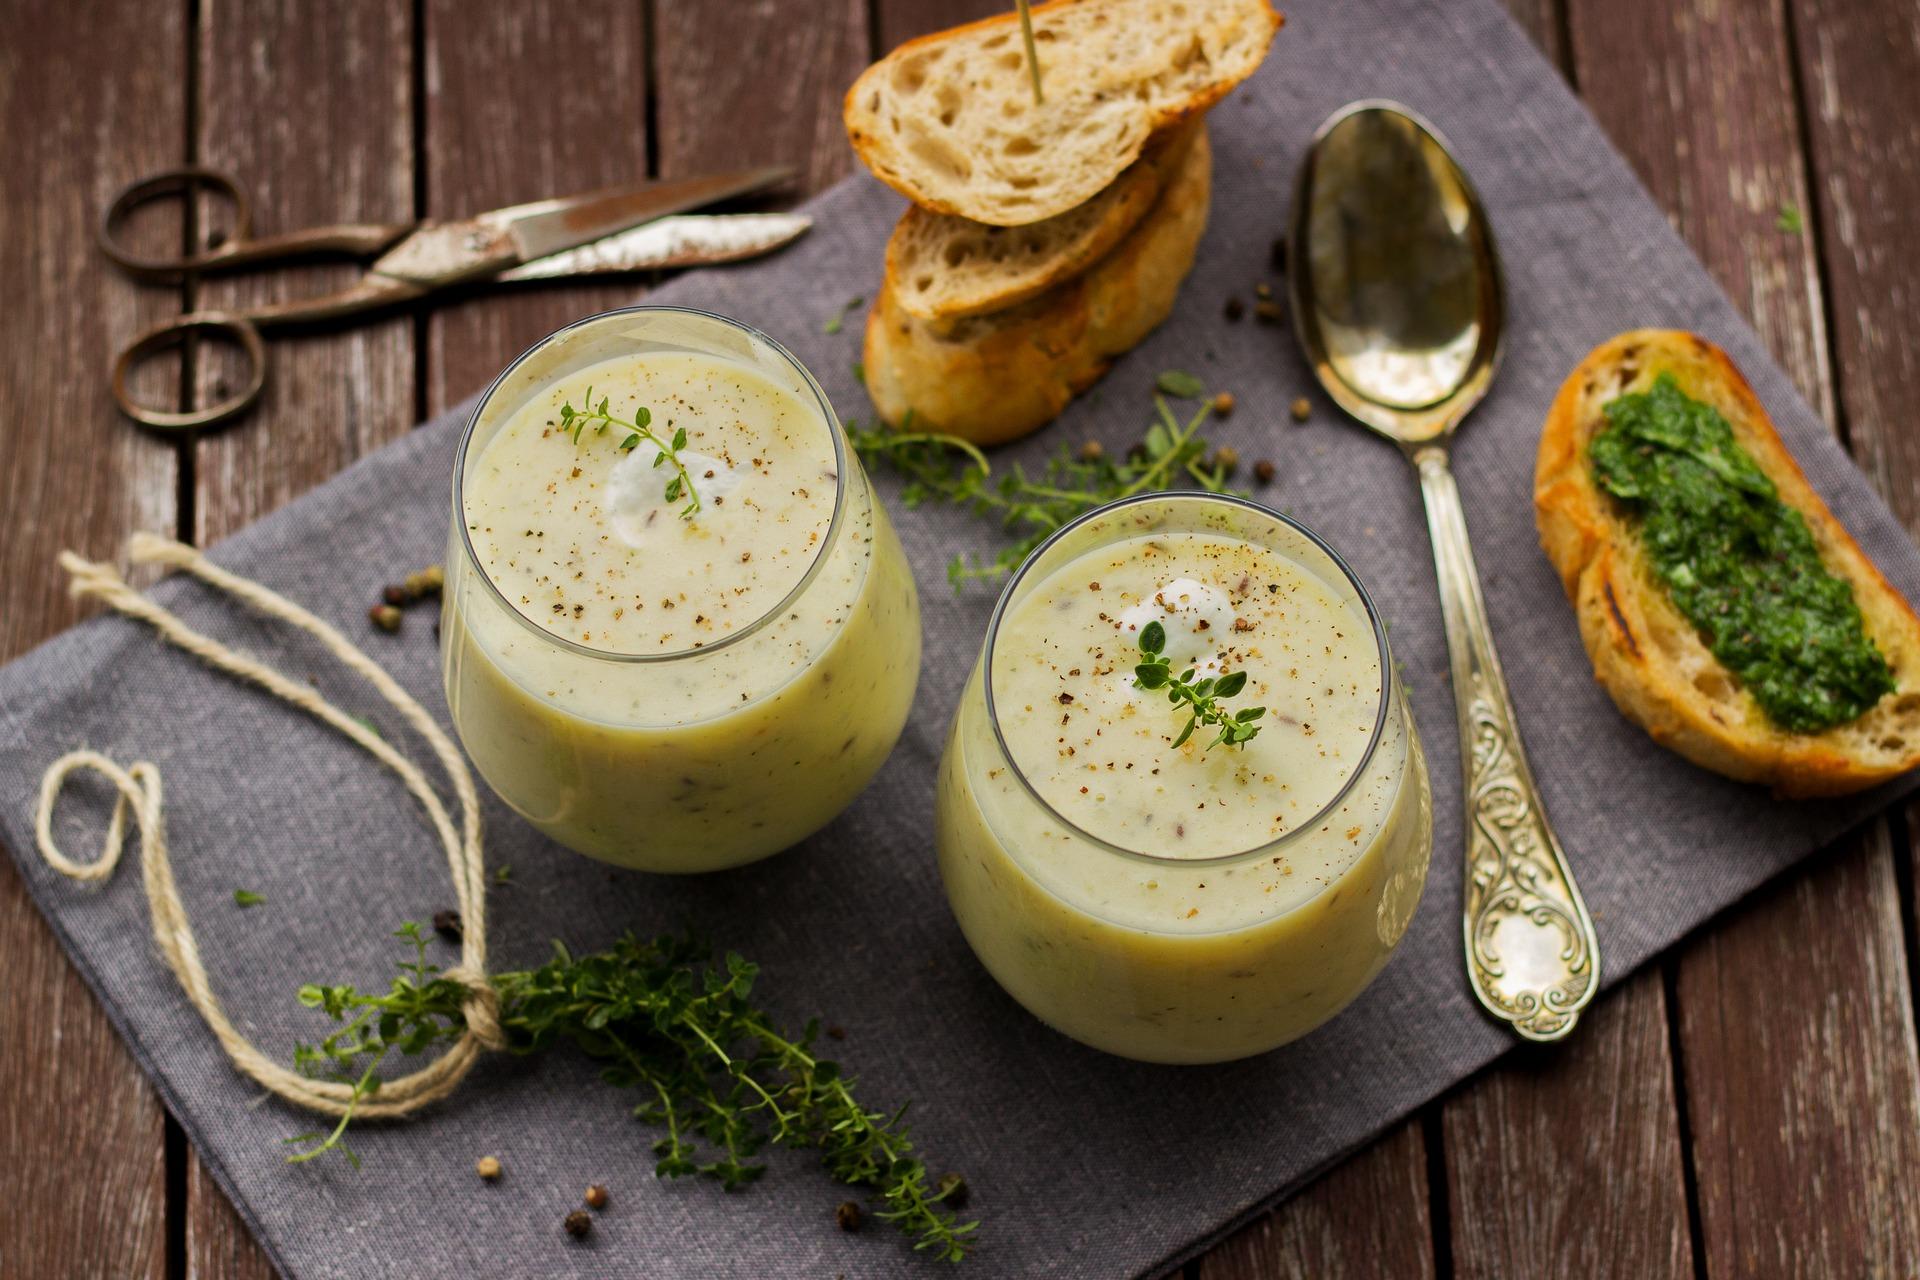 Italian style garlic soup